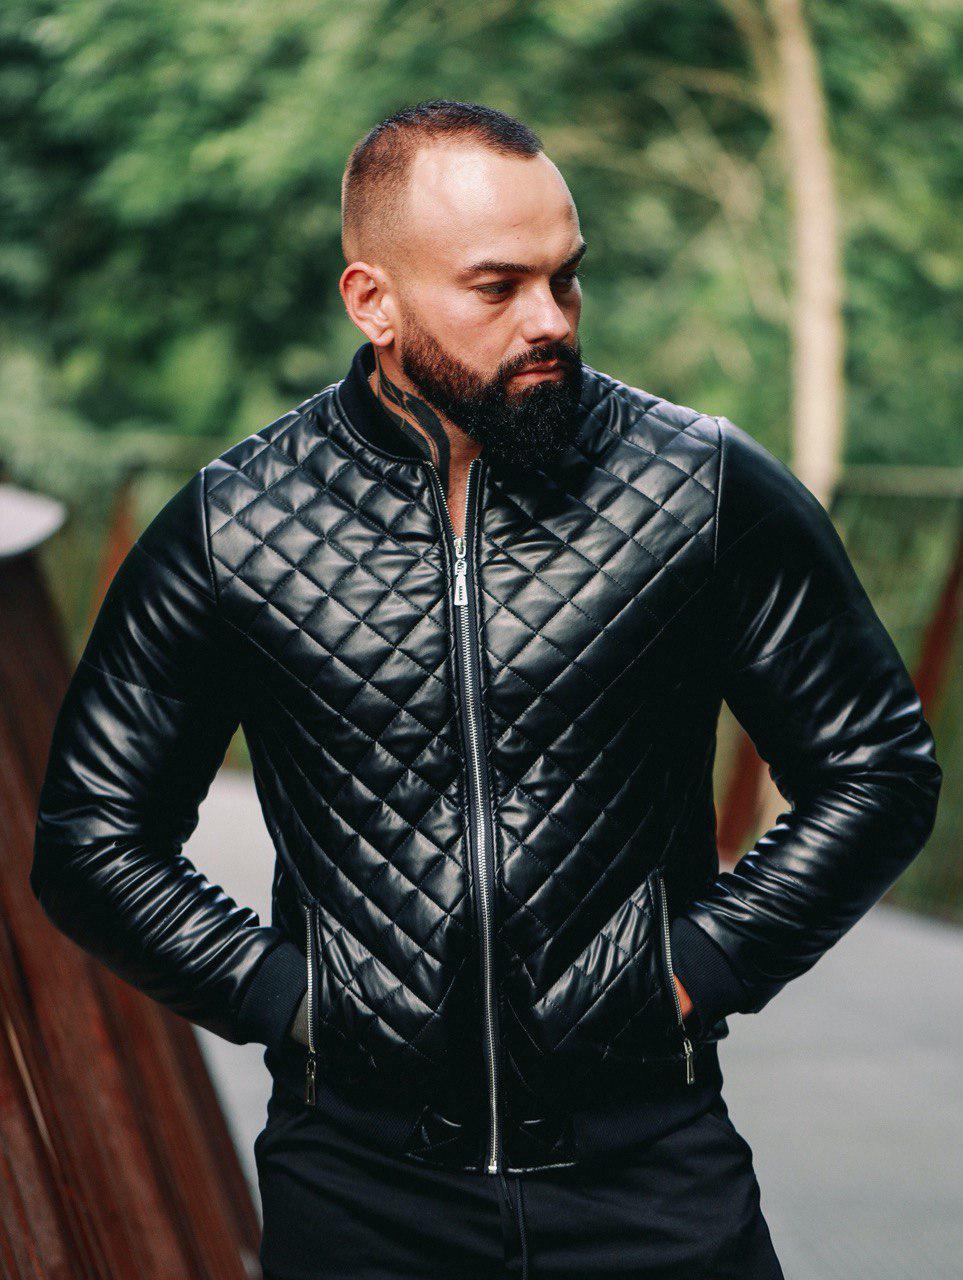 Мужская куртка. Кожаный бомбер.